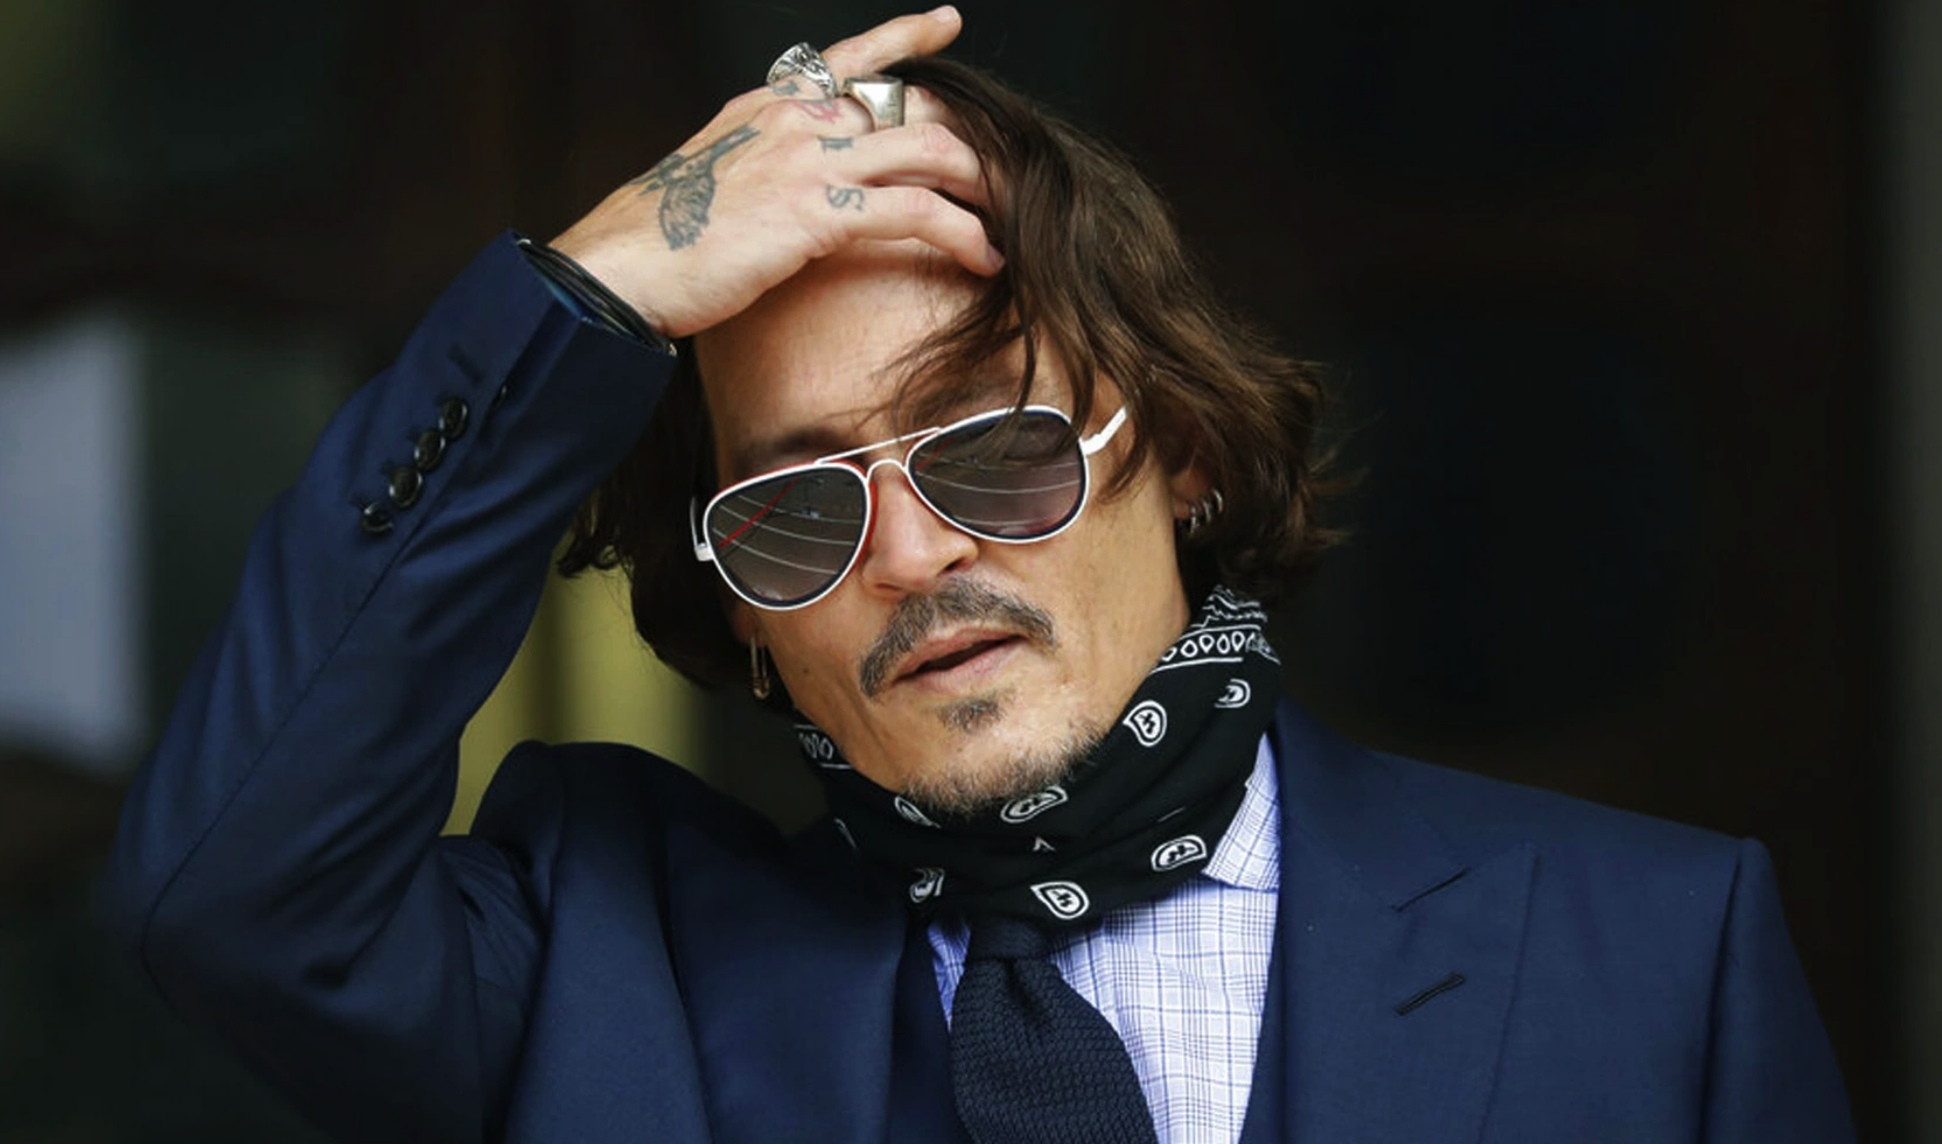 Johnny Depp promoting crypto